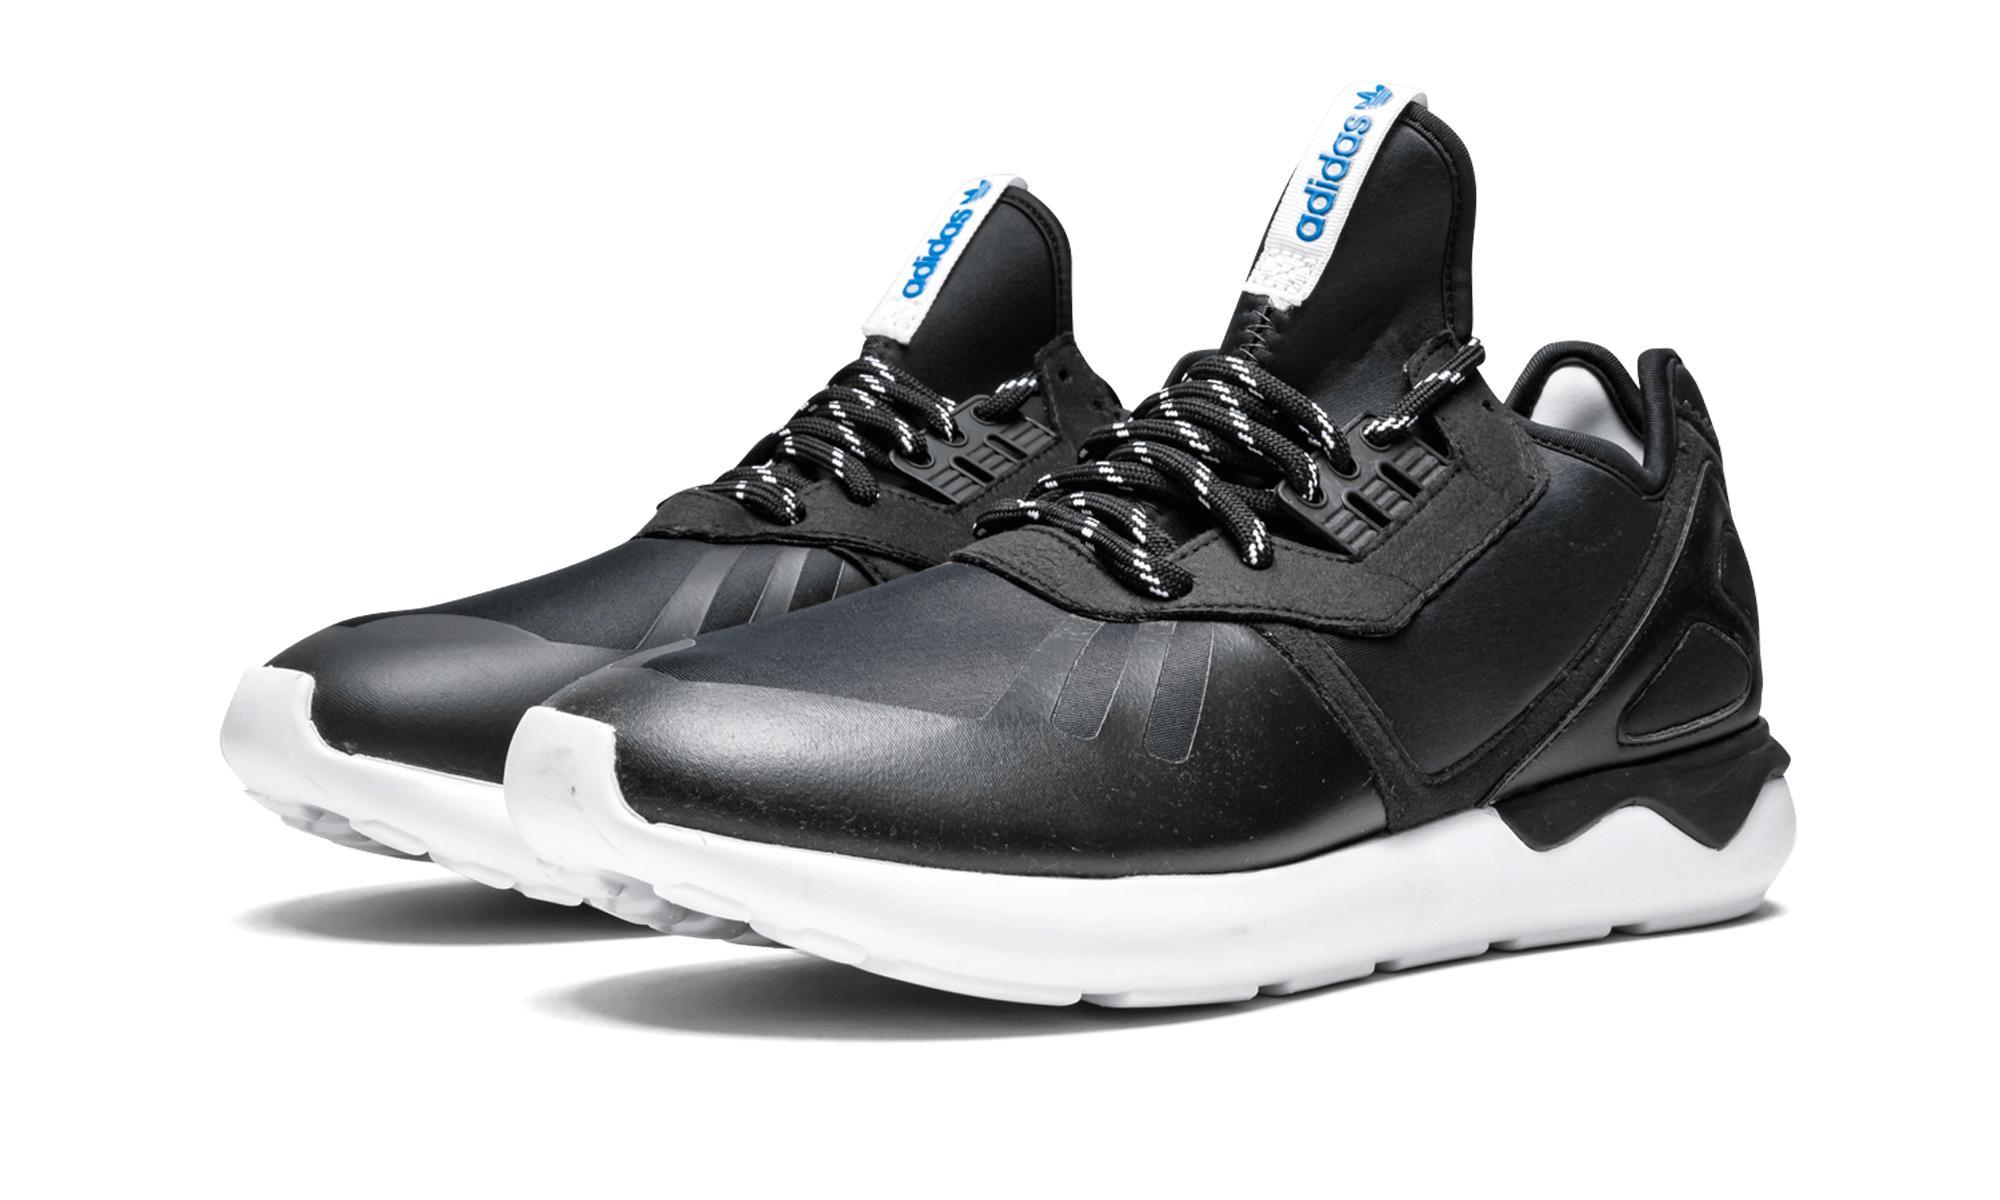 87bbbbffb47b Adidas - Black Tubular Runner for Men - Lyst. View fullscreen